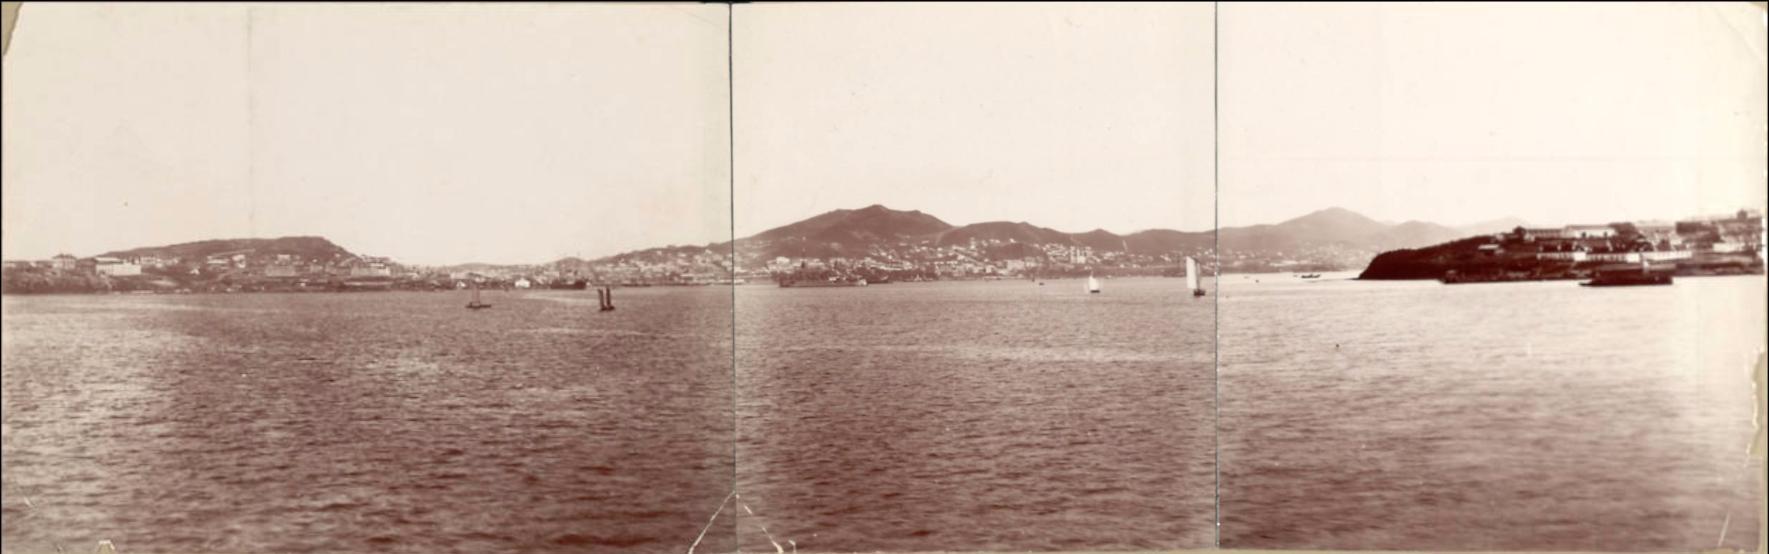 Панорама города с моря. 1894.